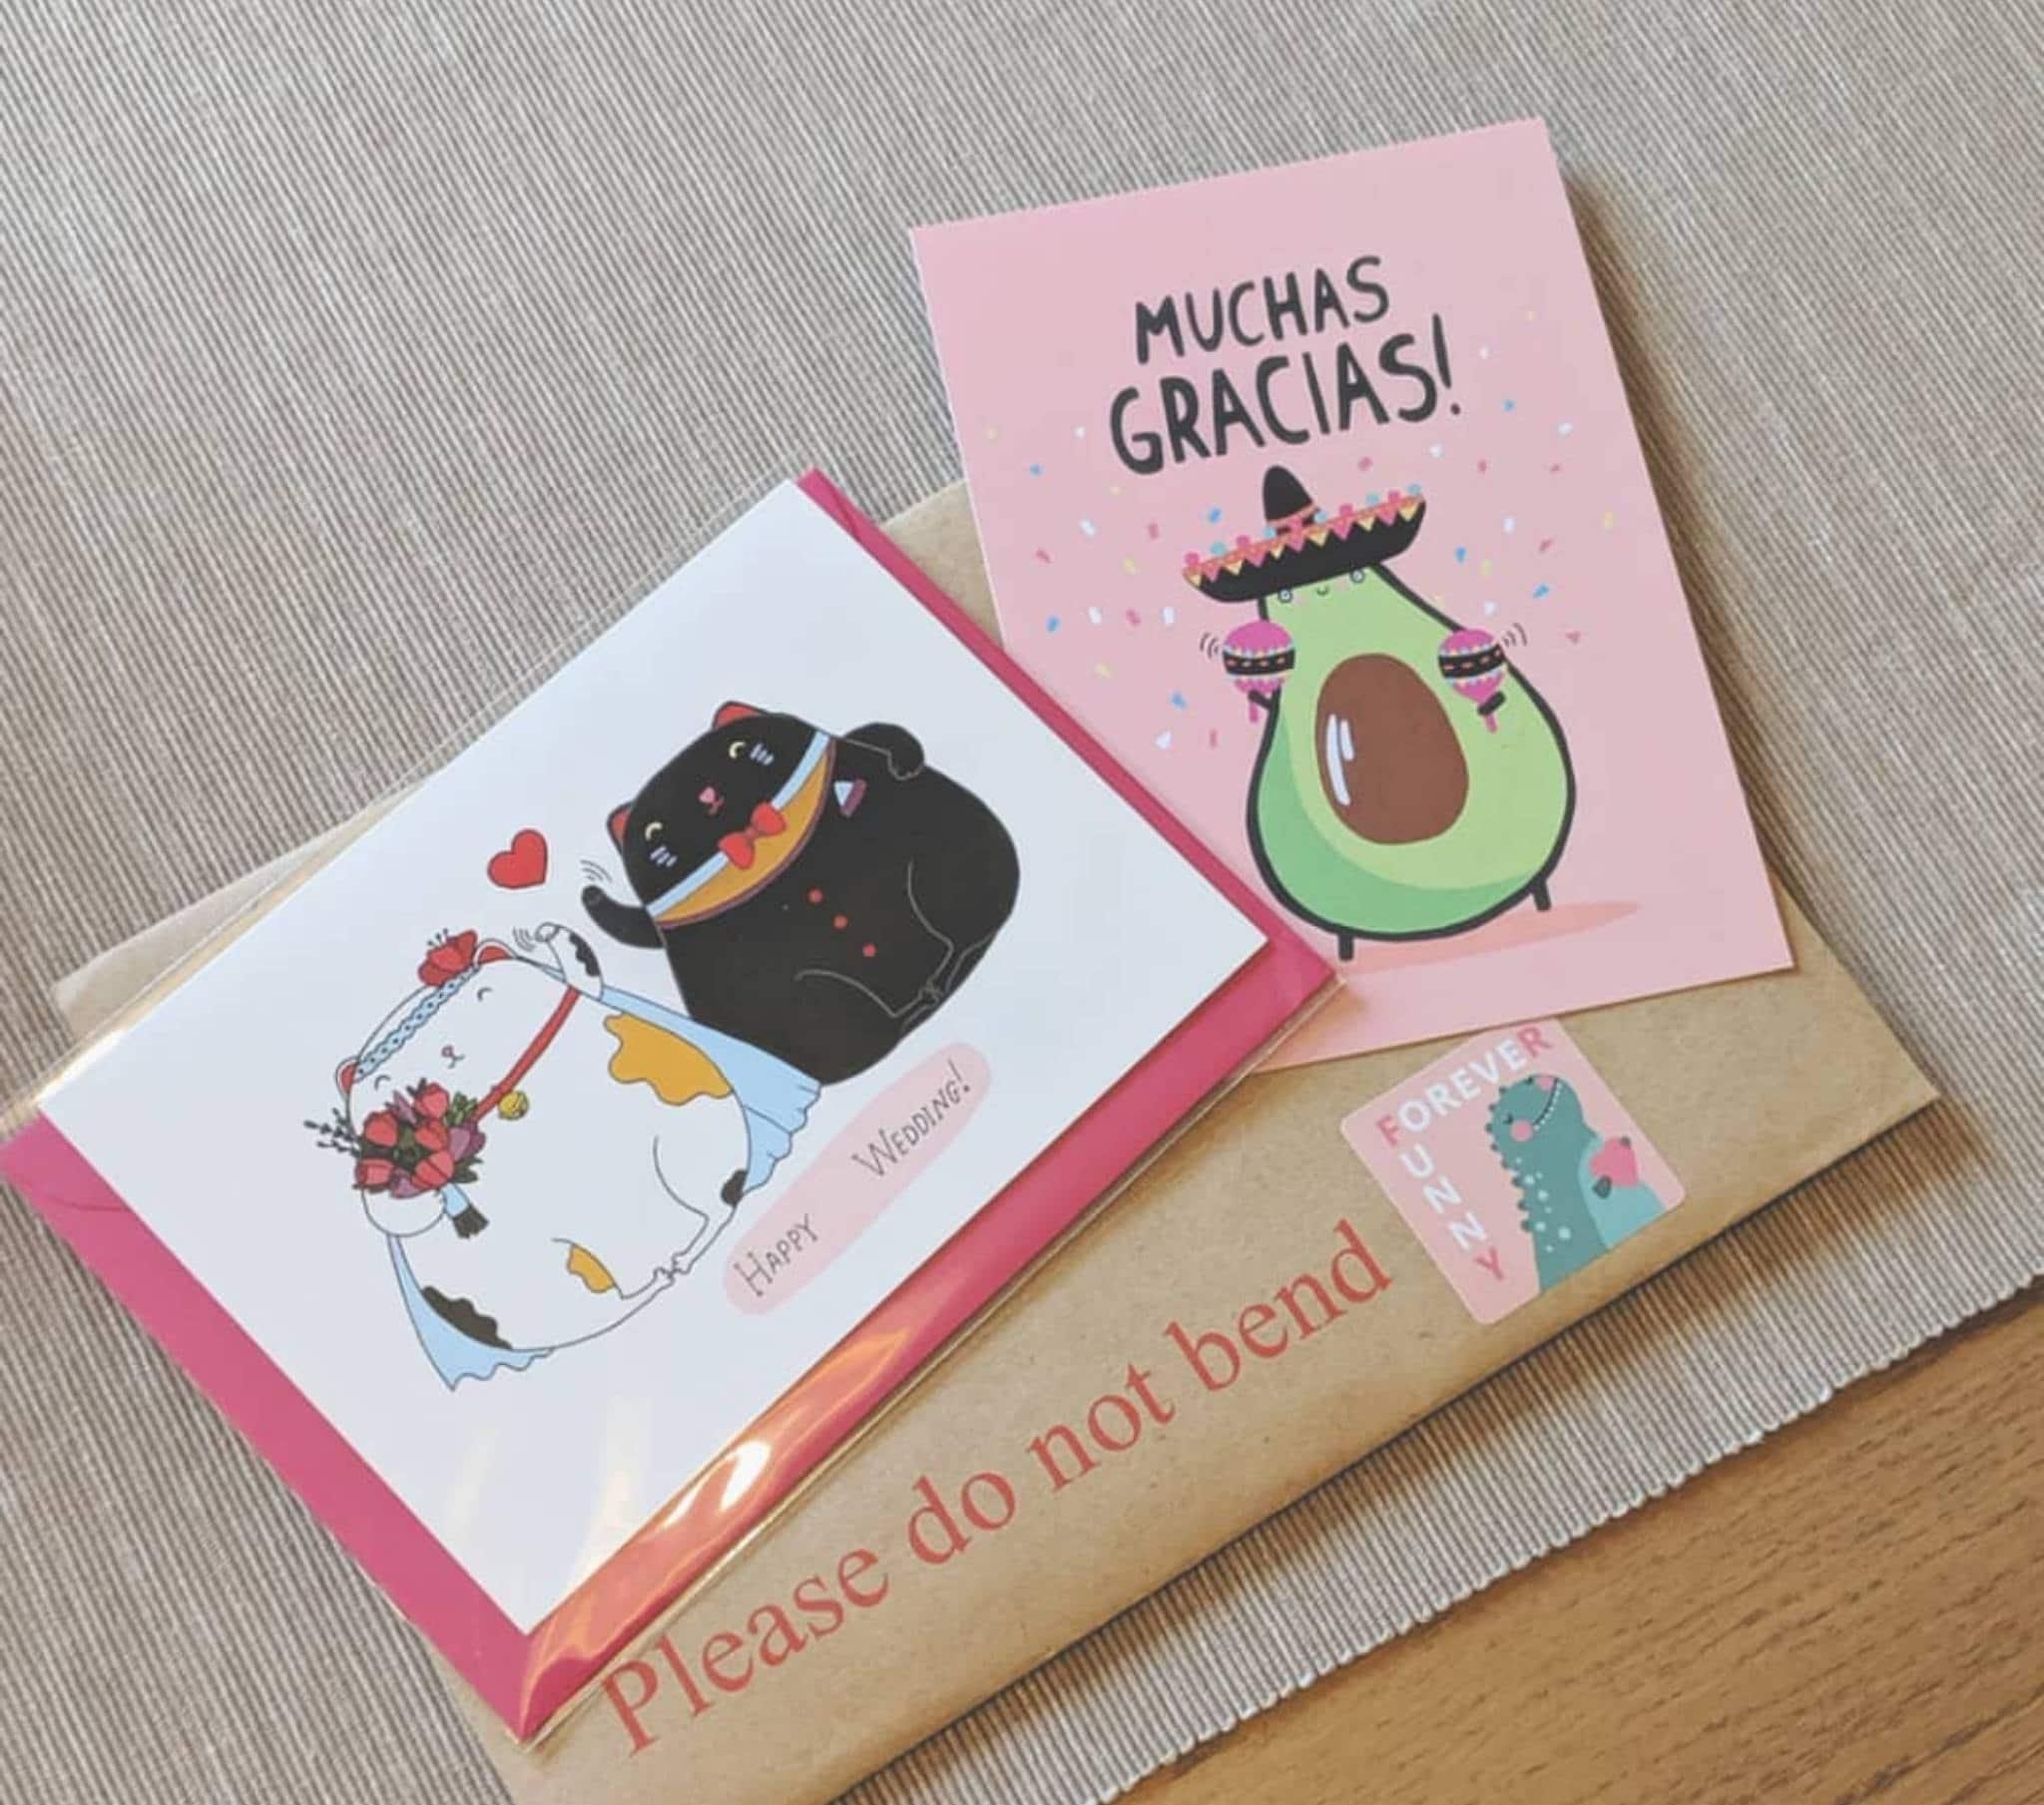 Gabriella added a photo of their purchase